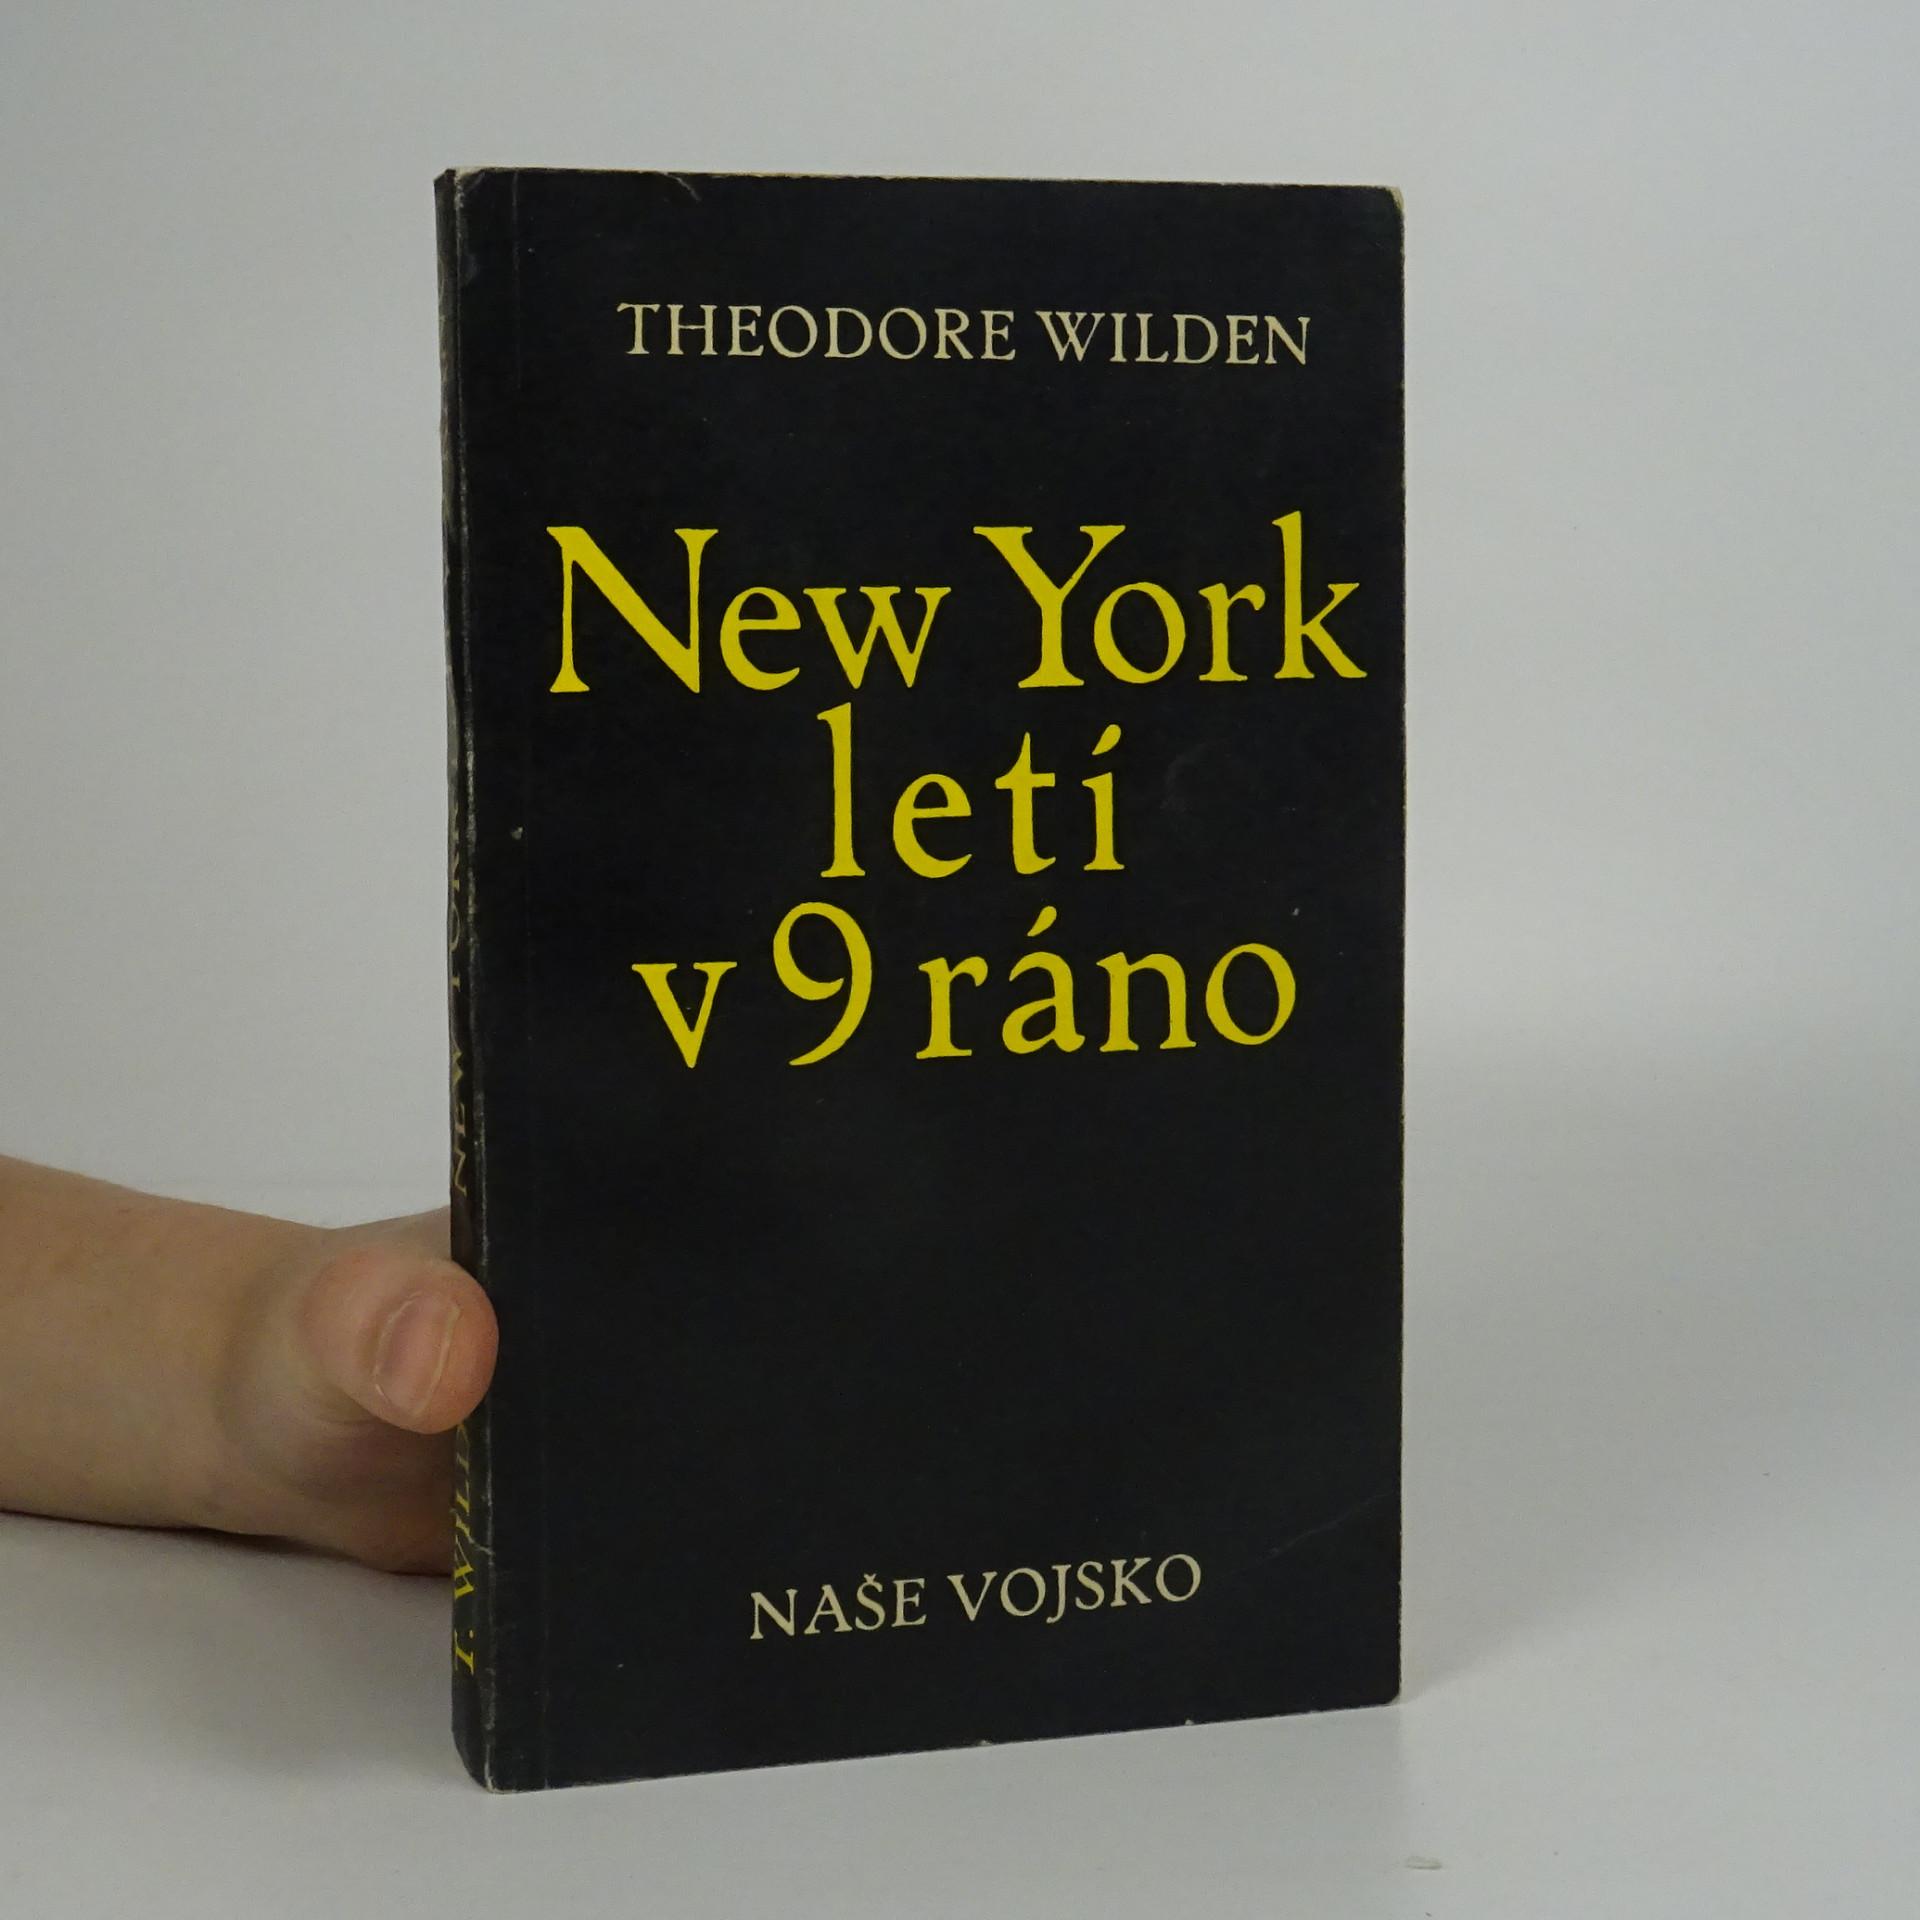 antikvární kniha New York letí v 9 ráno, 1967